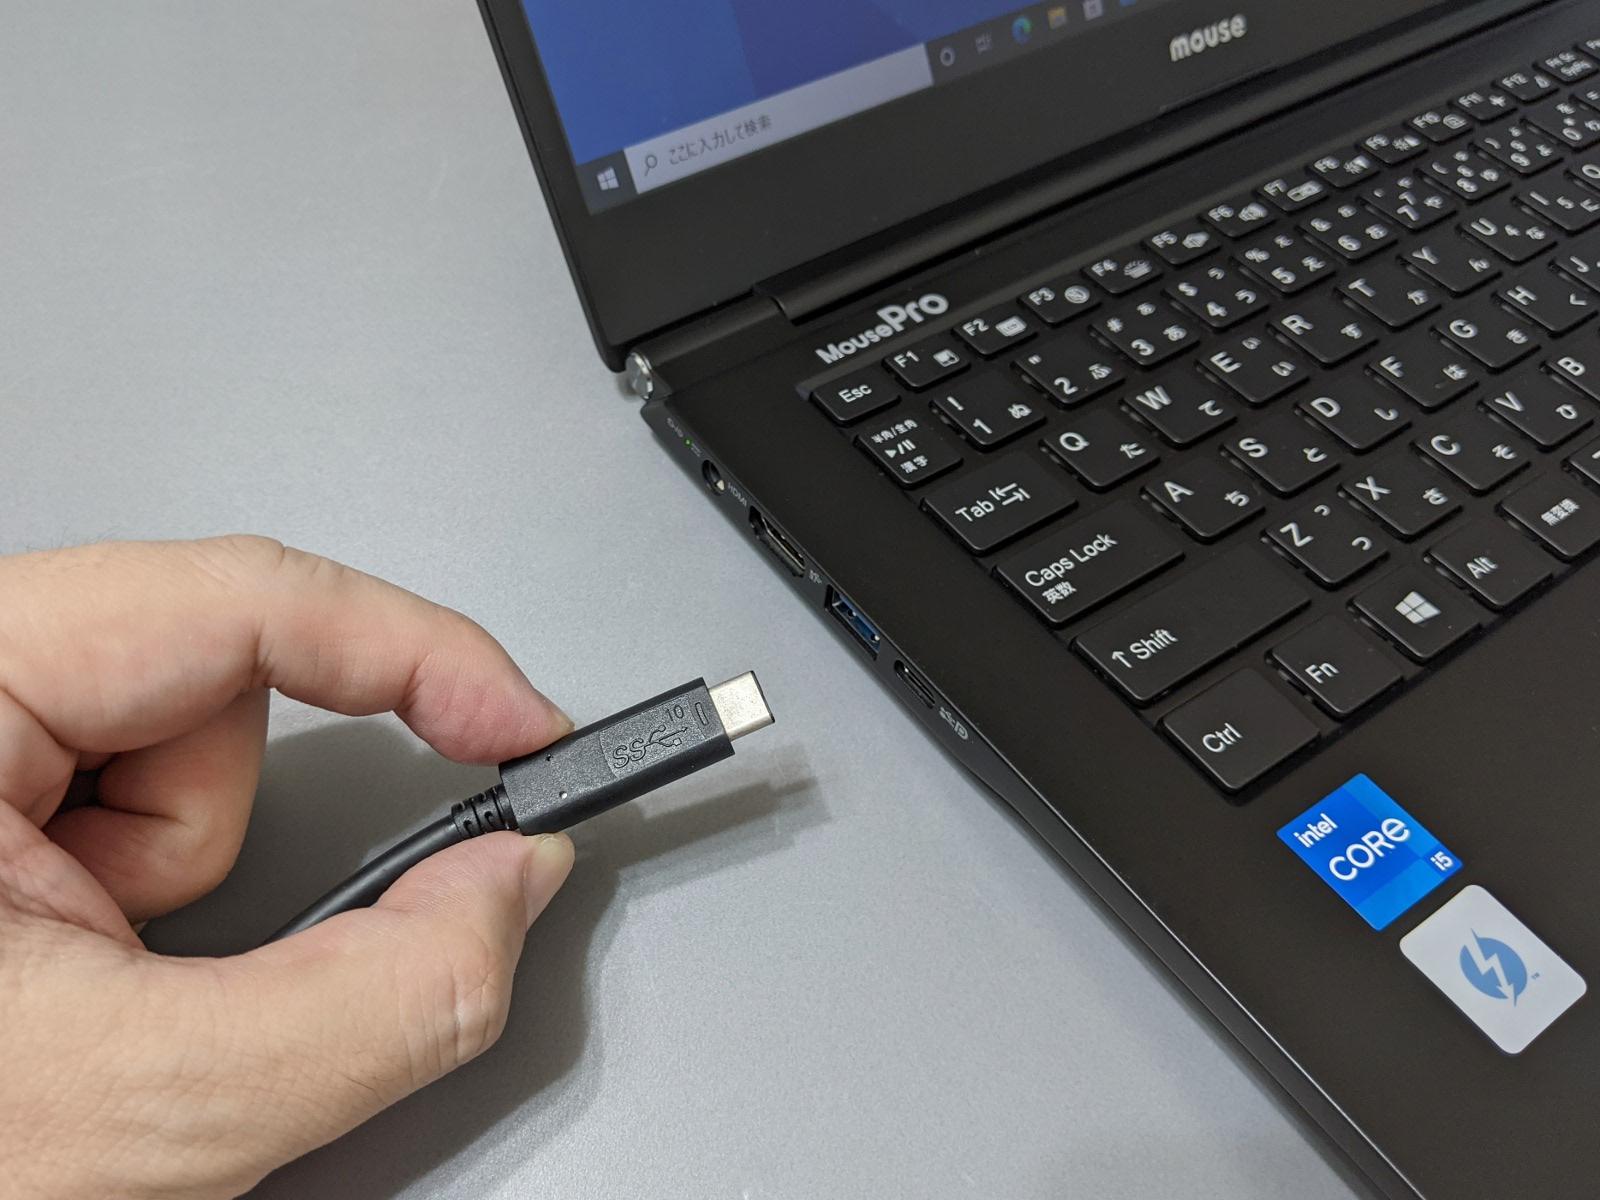 「USB 3.0」=「USB 3.1 Gen 1」=「USB 3.2 Gen 1」? すぐ分かるUSBの「Gen」表記ルール